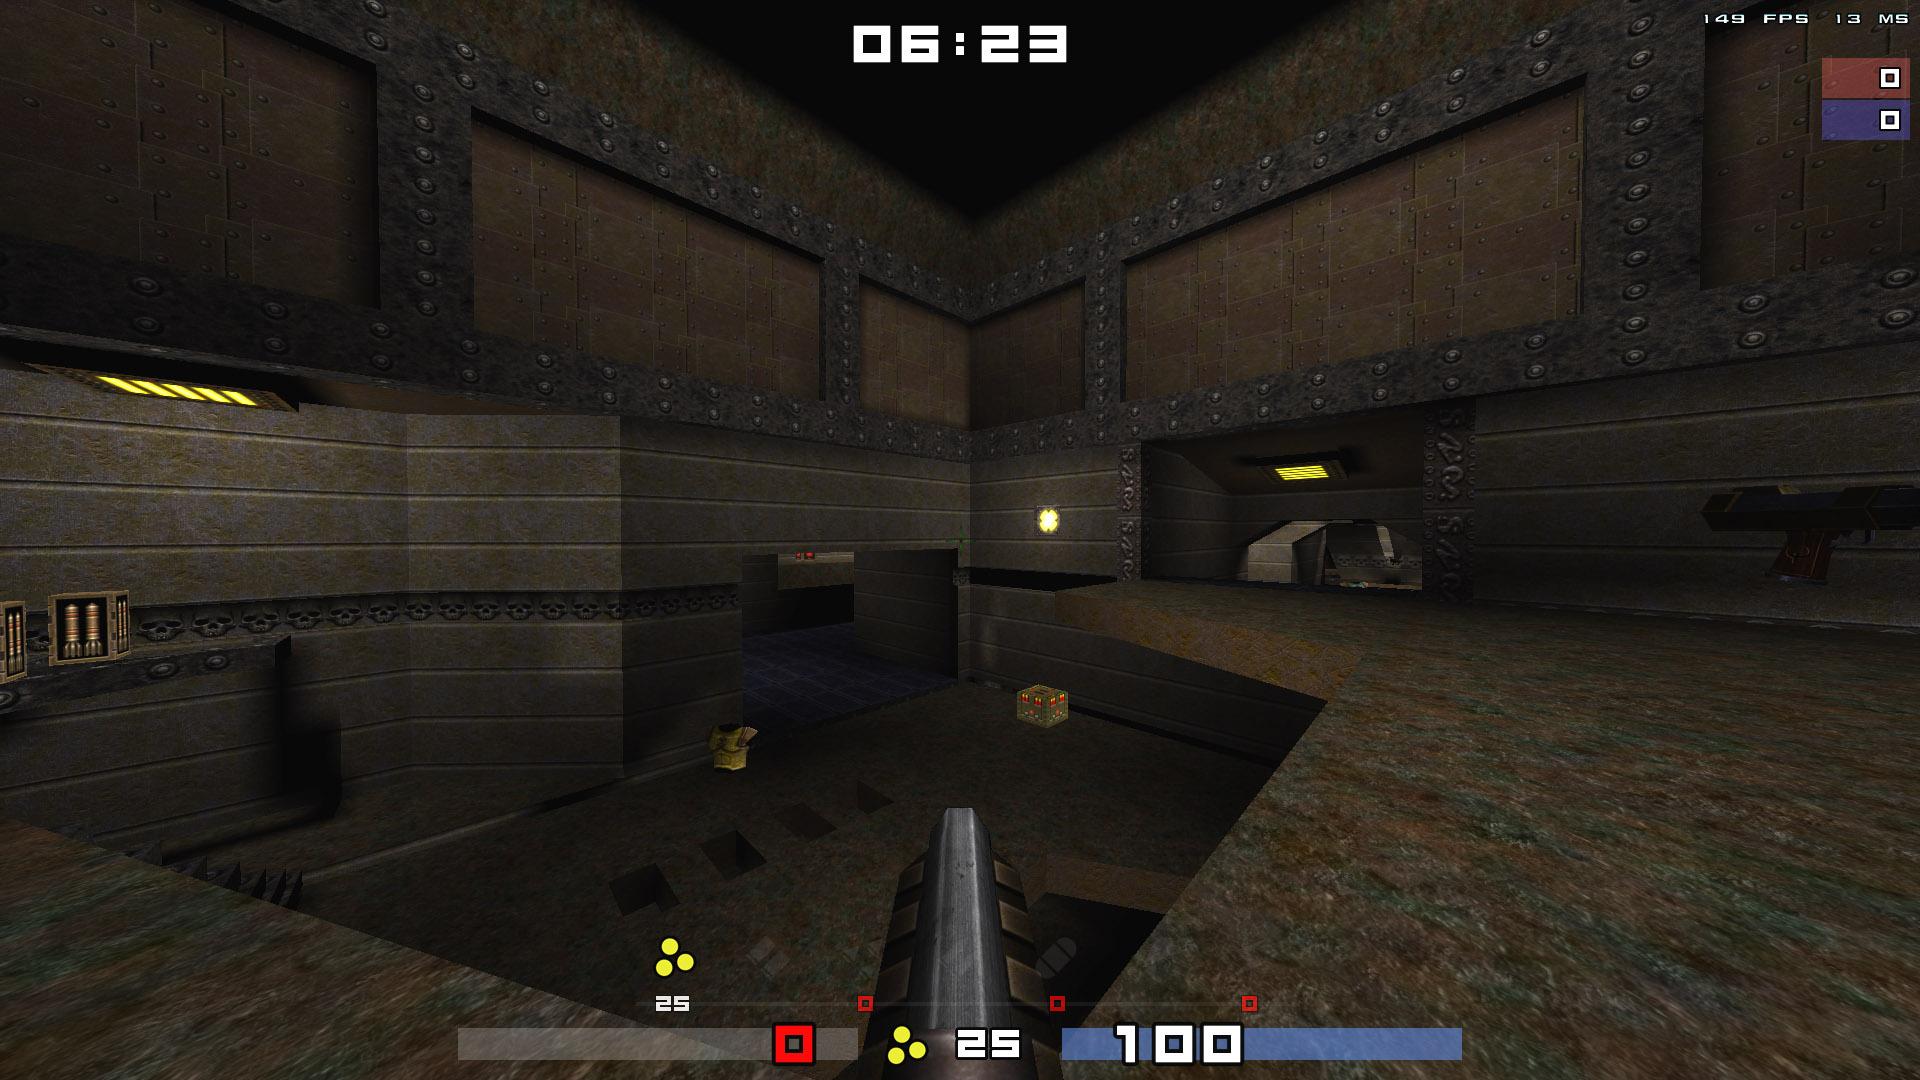 http://www.redshift.hu/sylon/junkdrome5.jpg